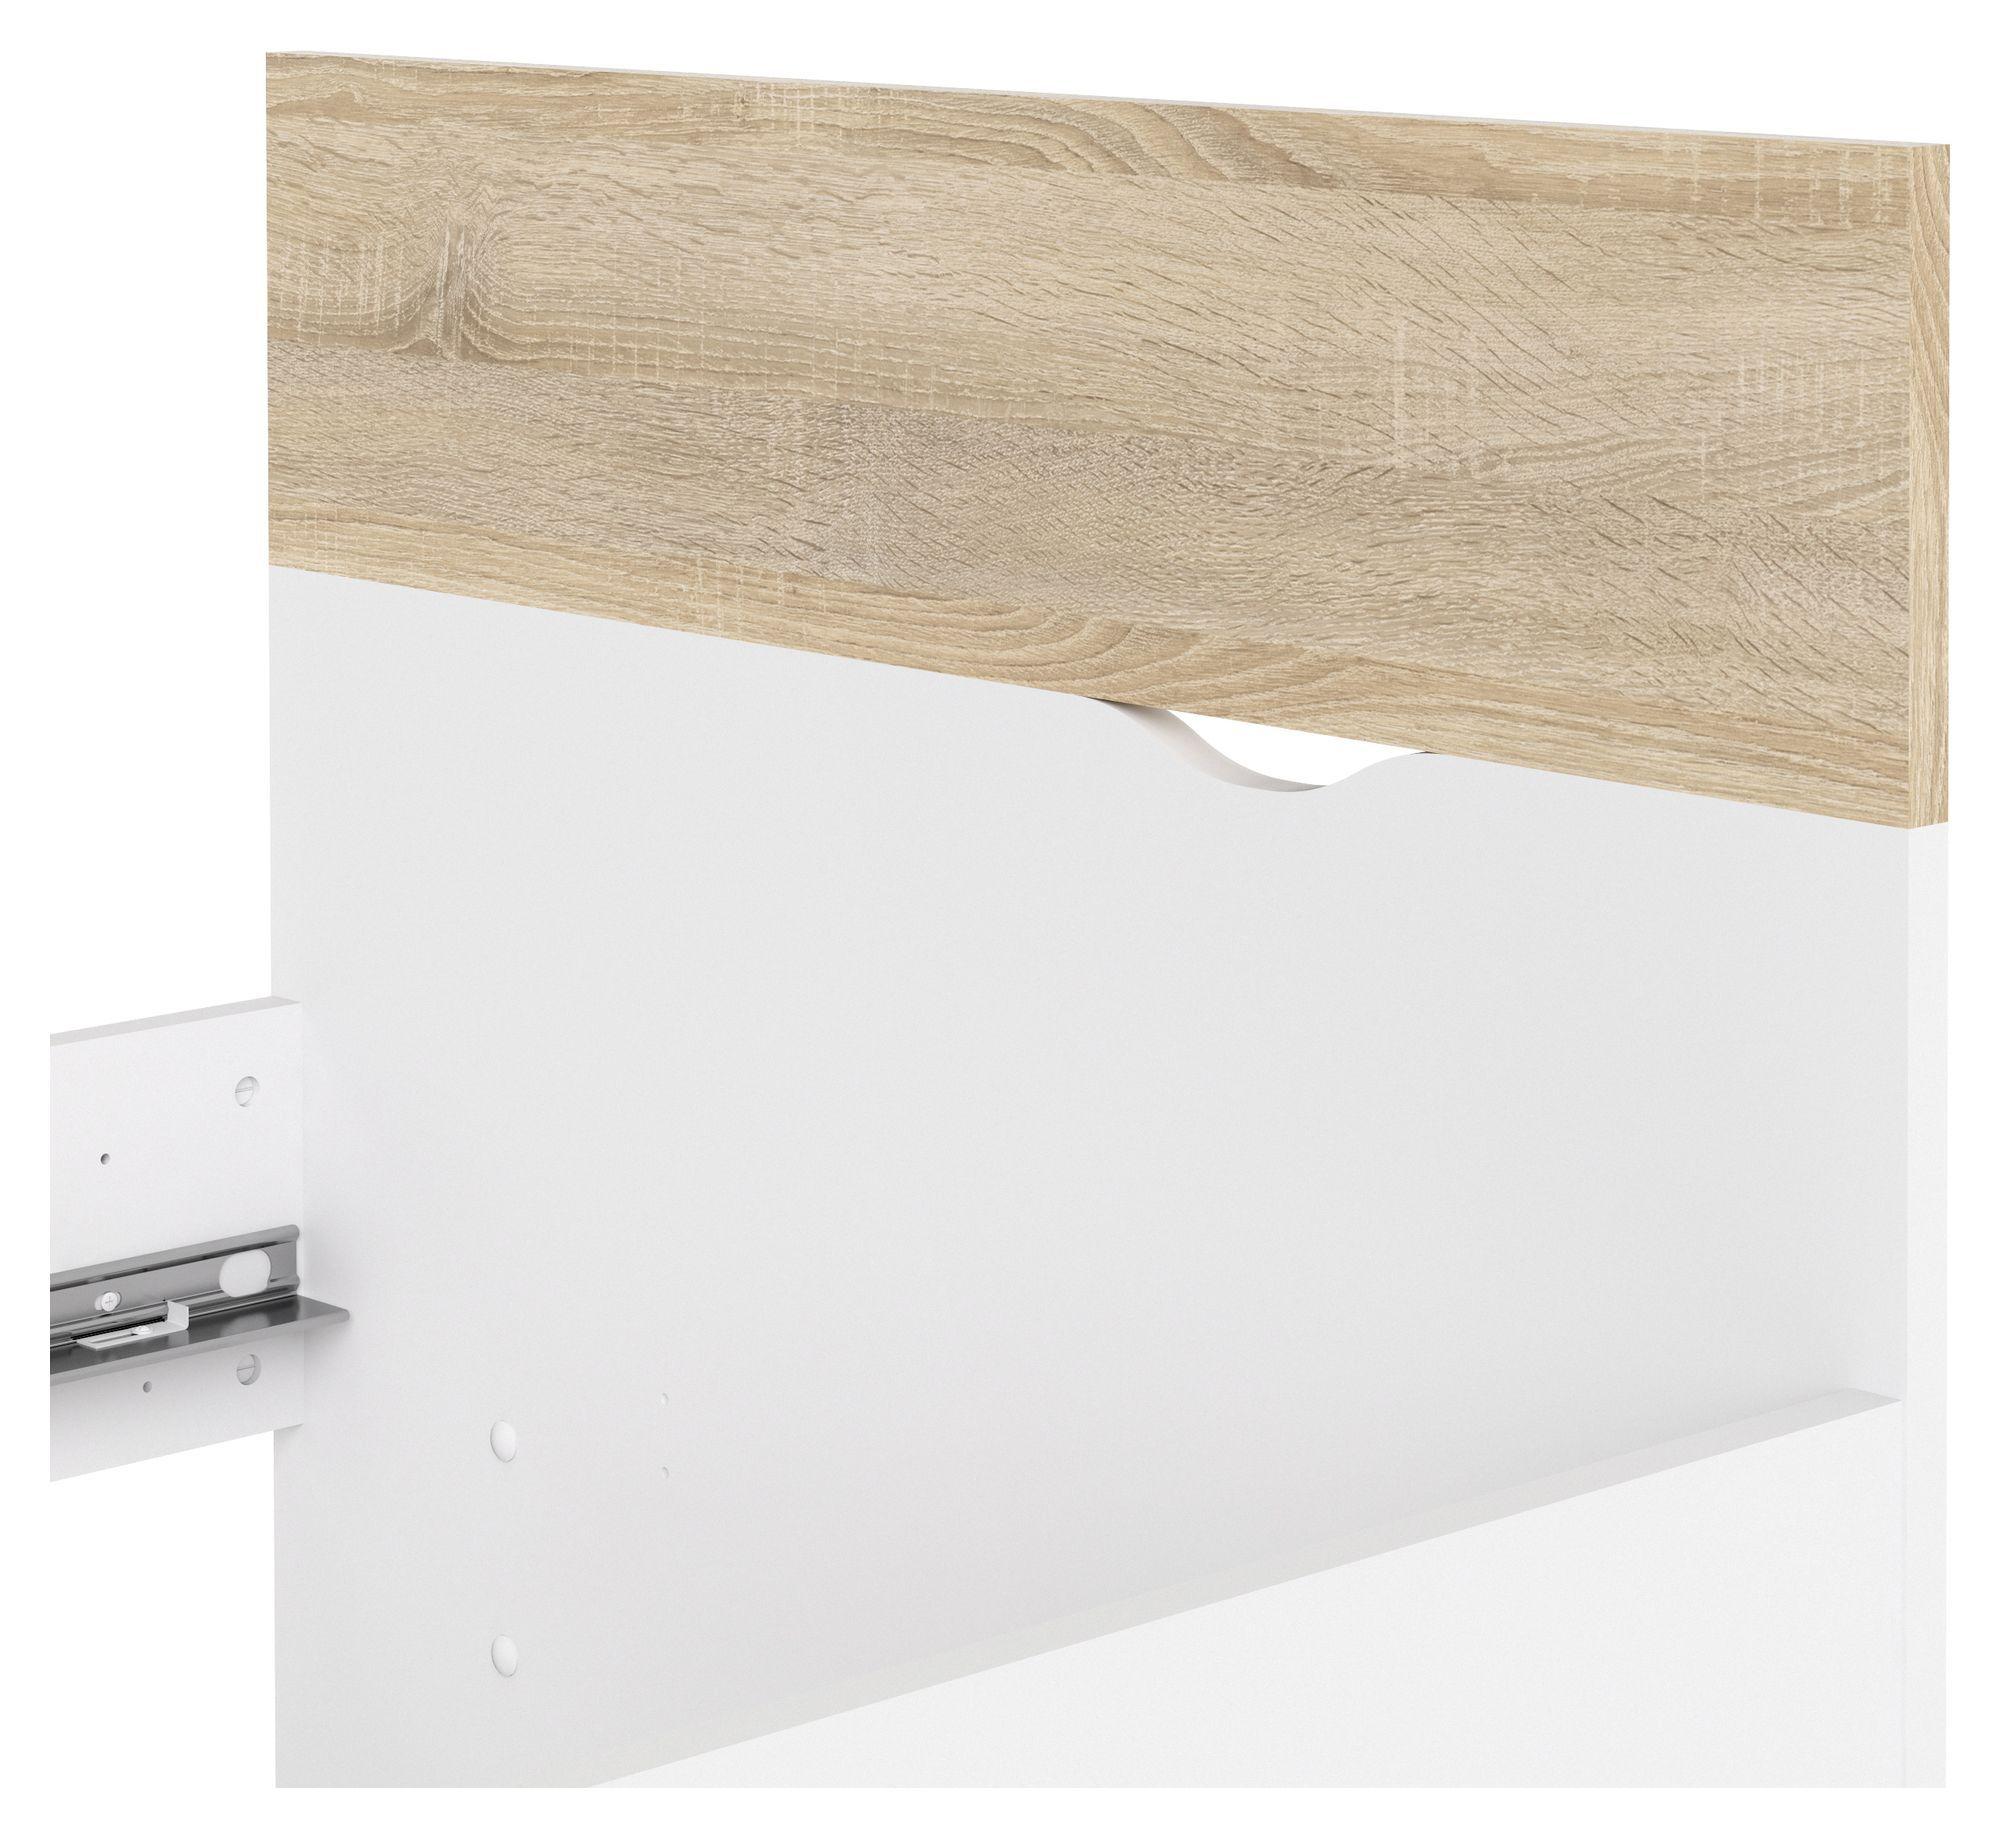 Delta Sengeramme - Egelook/Hvid, 90x200